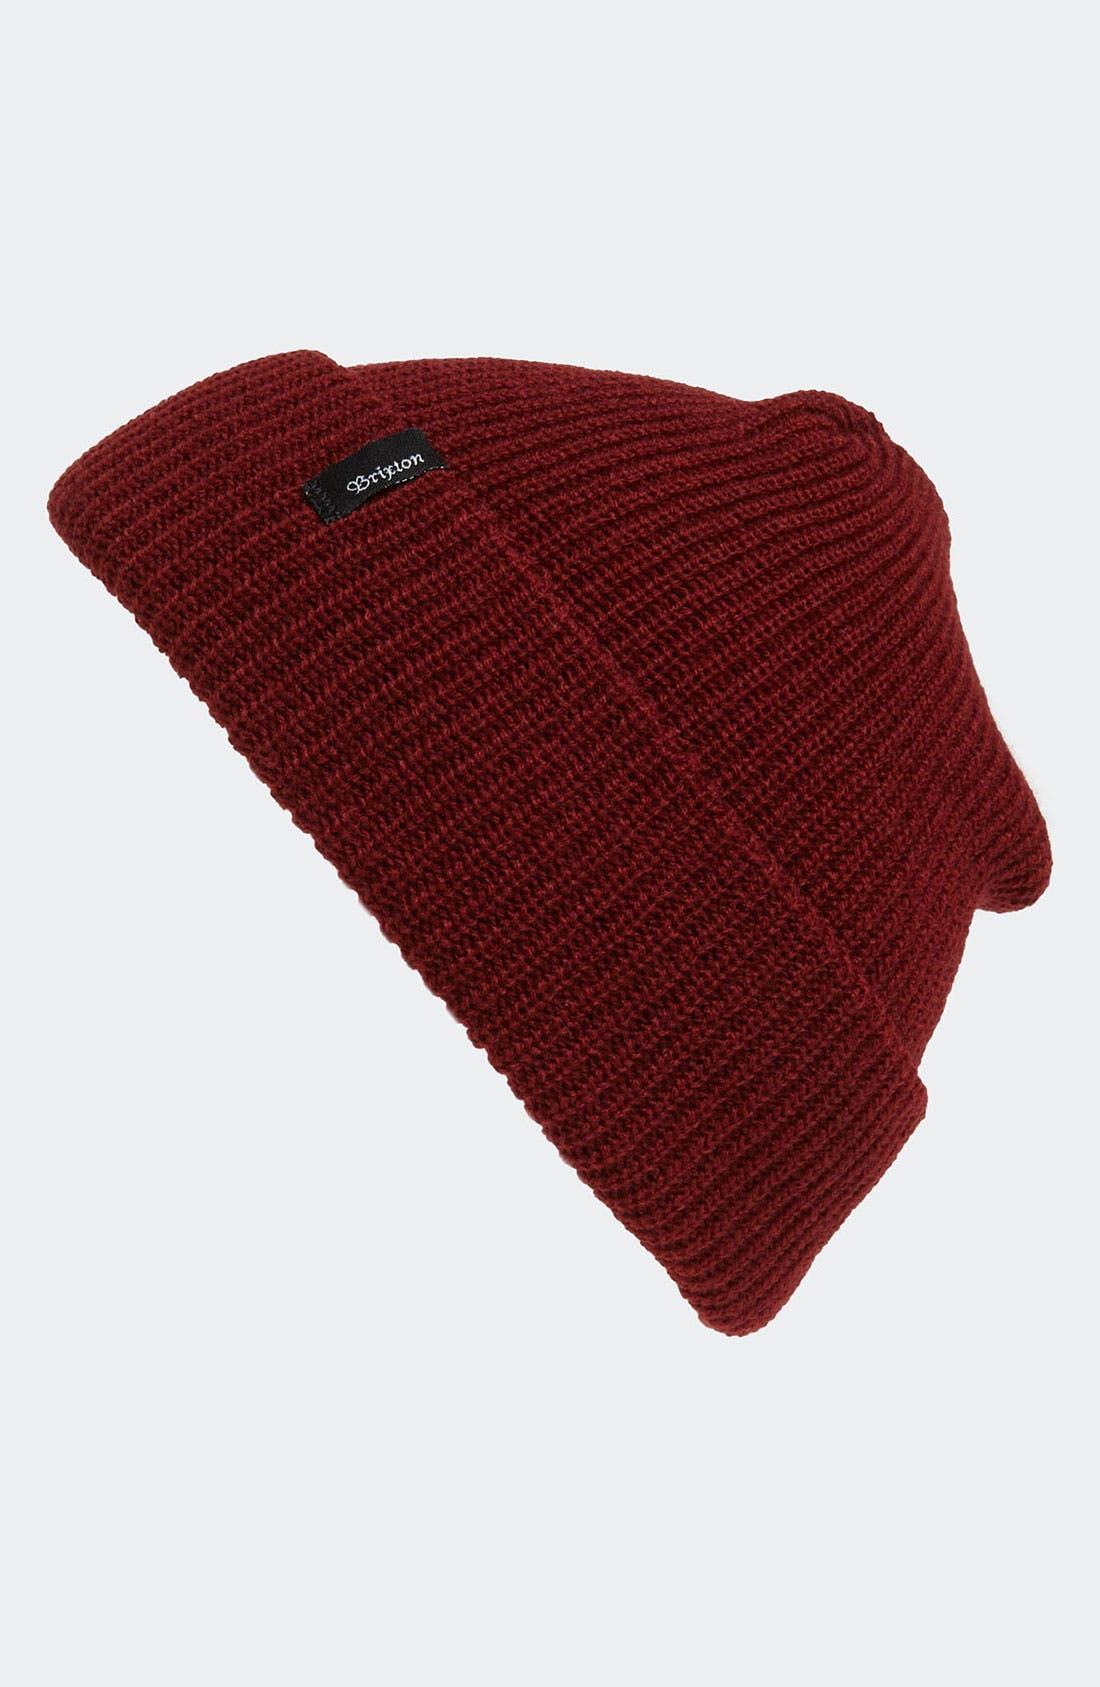 'Heist' Rib Knit Cap,                         Main,                         color, Burgundy